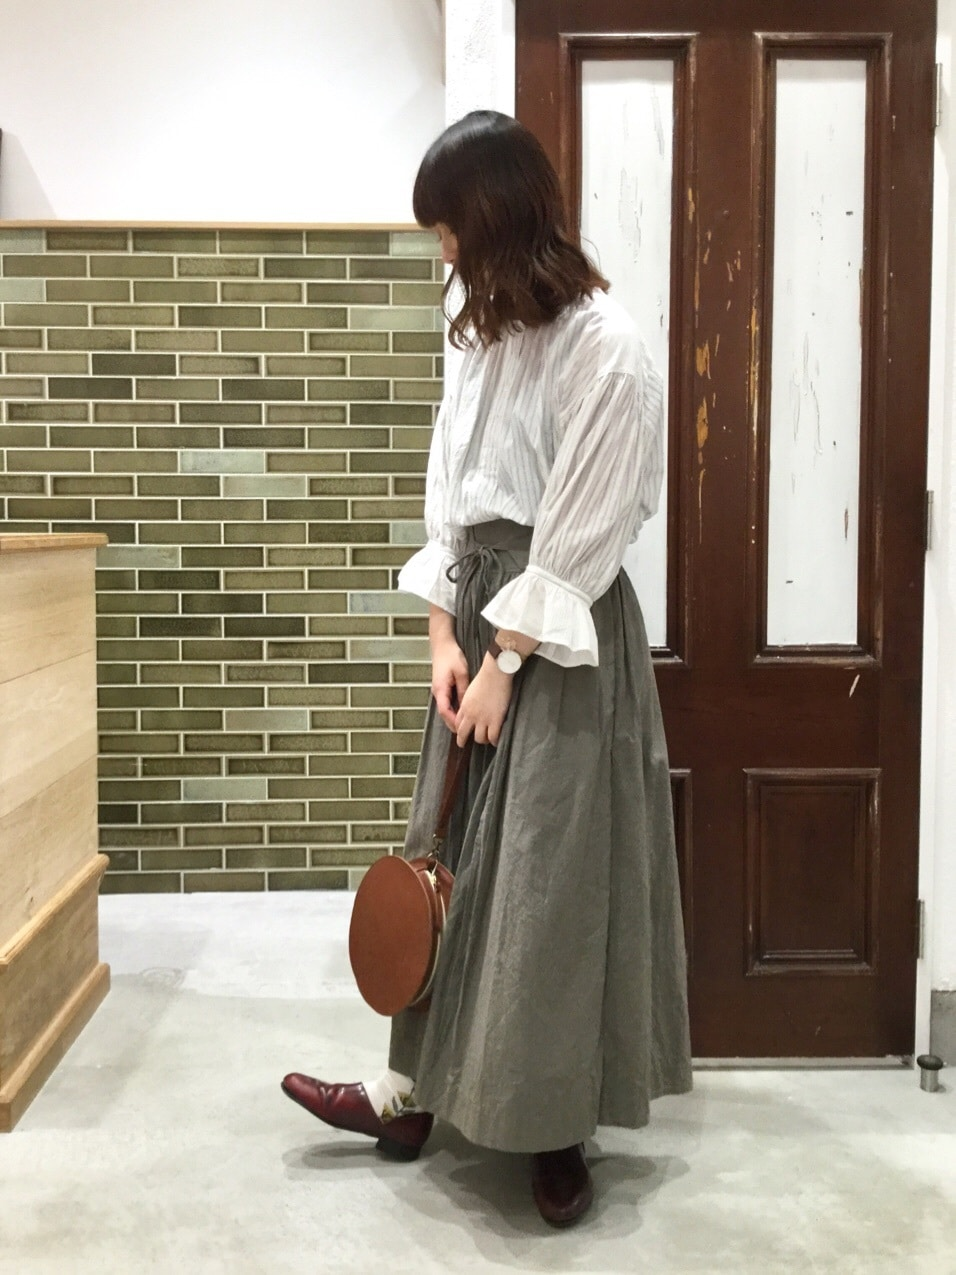 chambre de charme 横浜ジョイナス 身長:162cm 2020.08.19